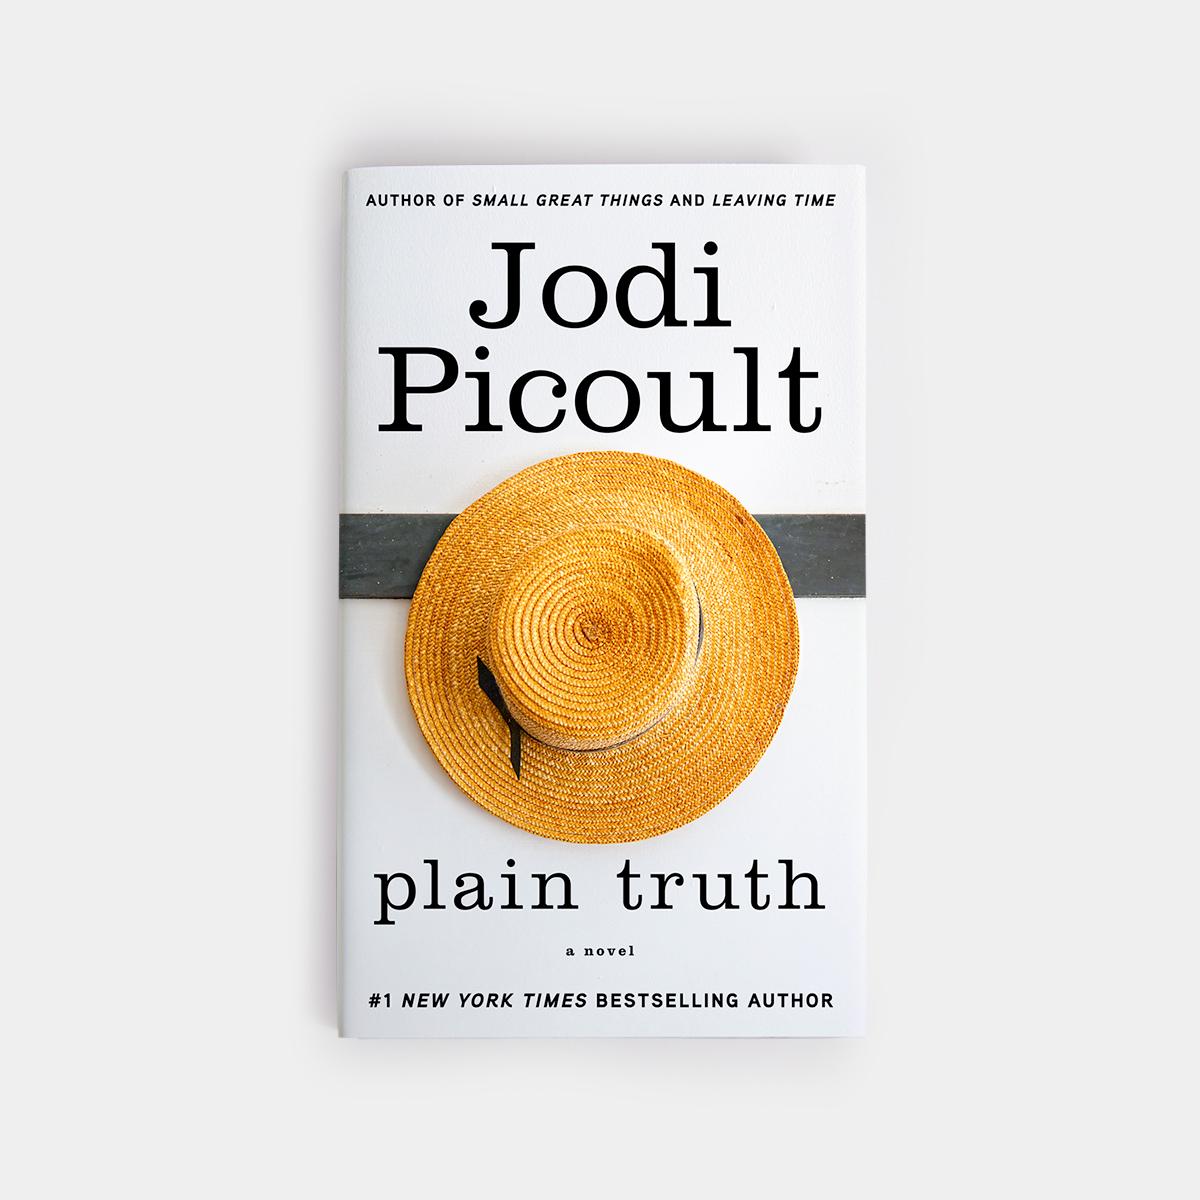 Jodi Picoult - annadorfman.com